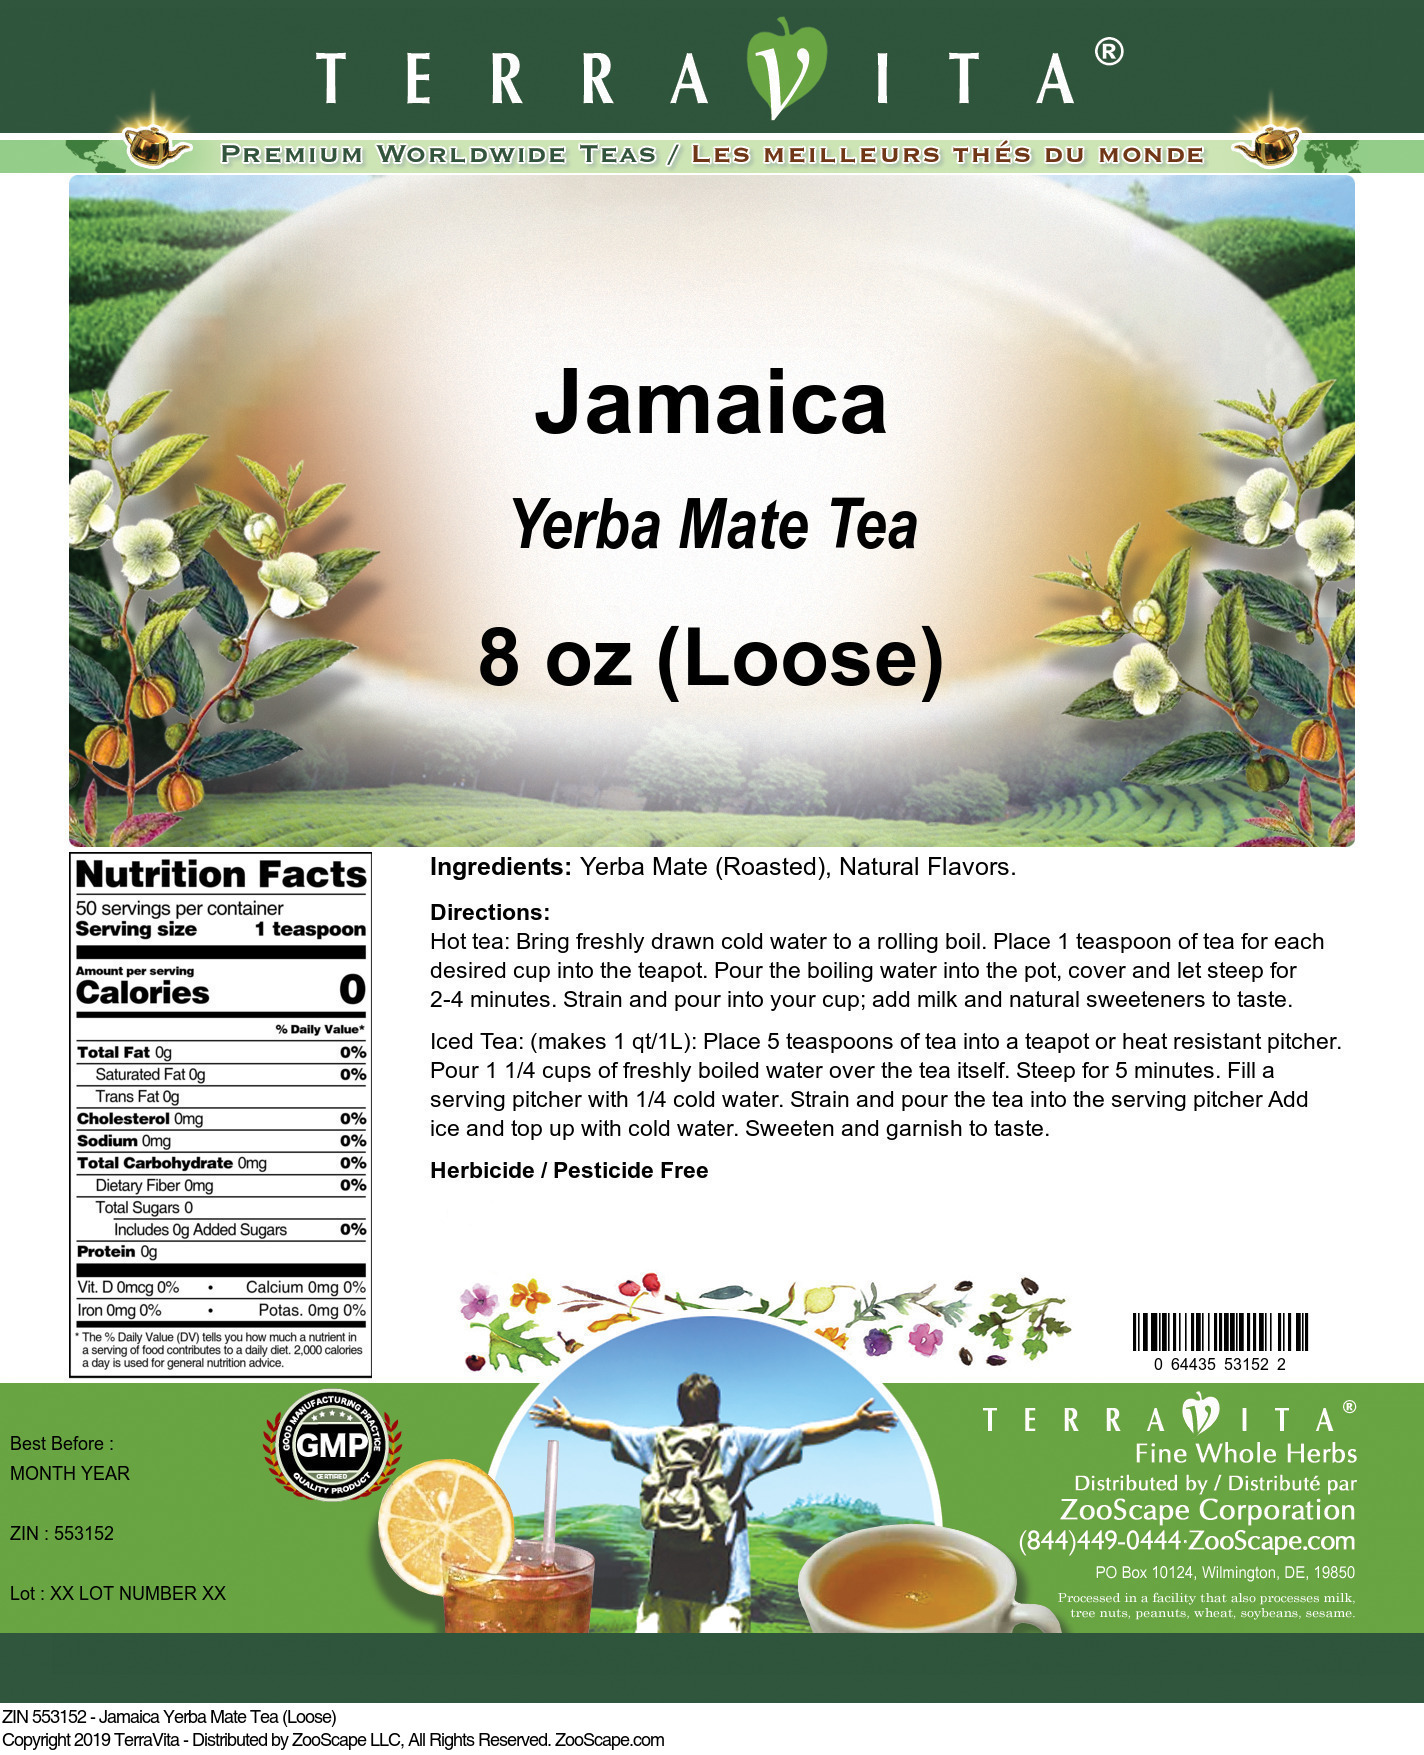 Jamaica Yerba Mate Tea (Loose)